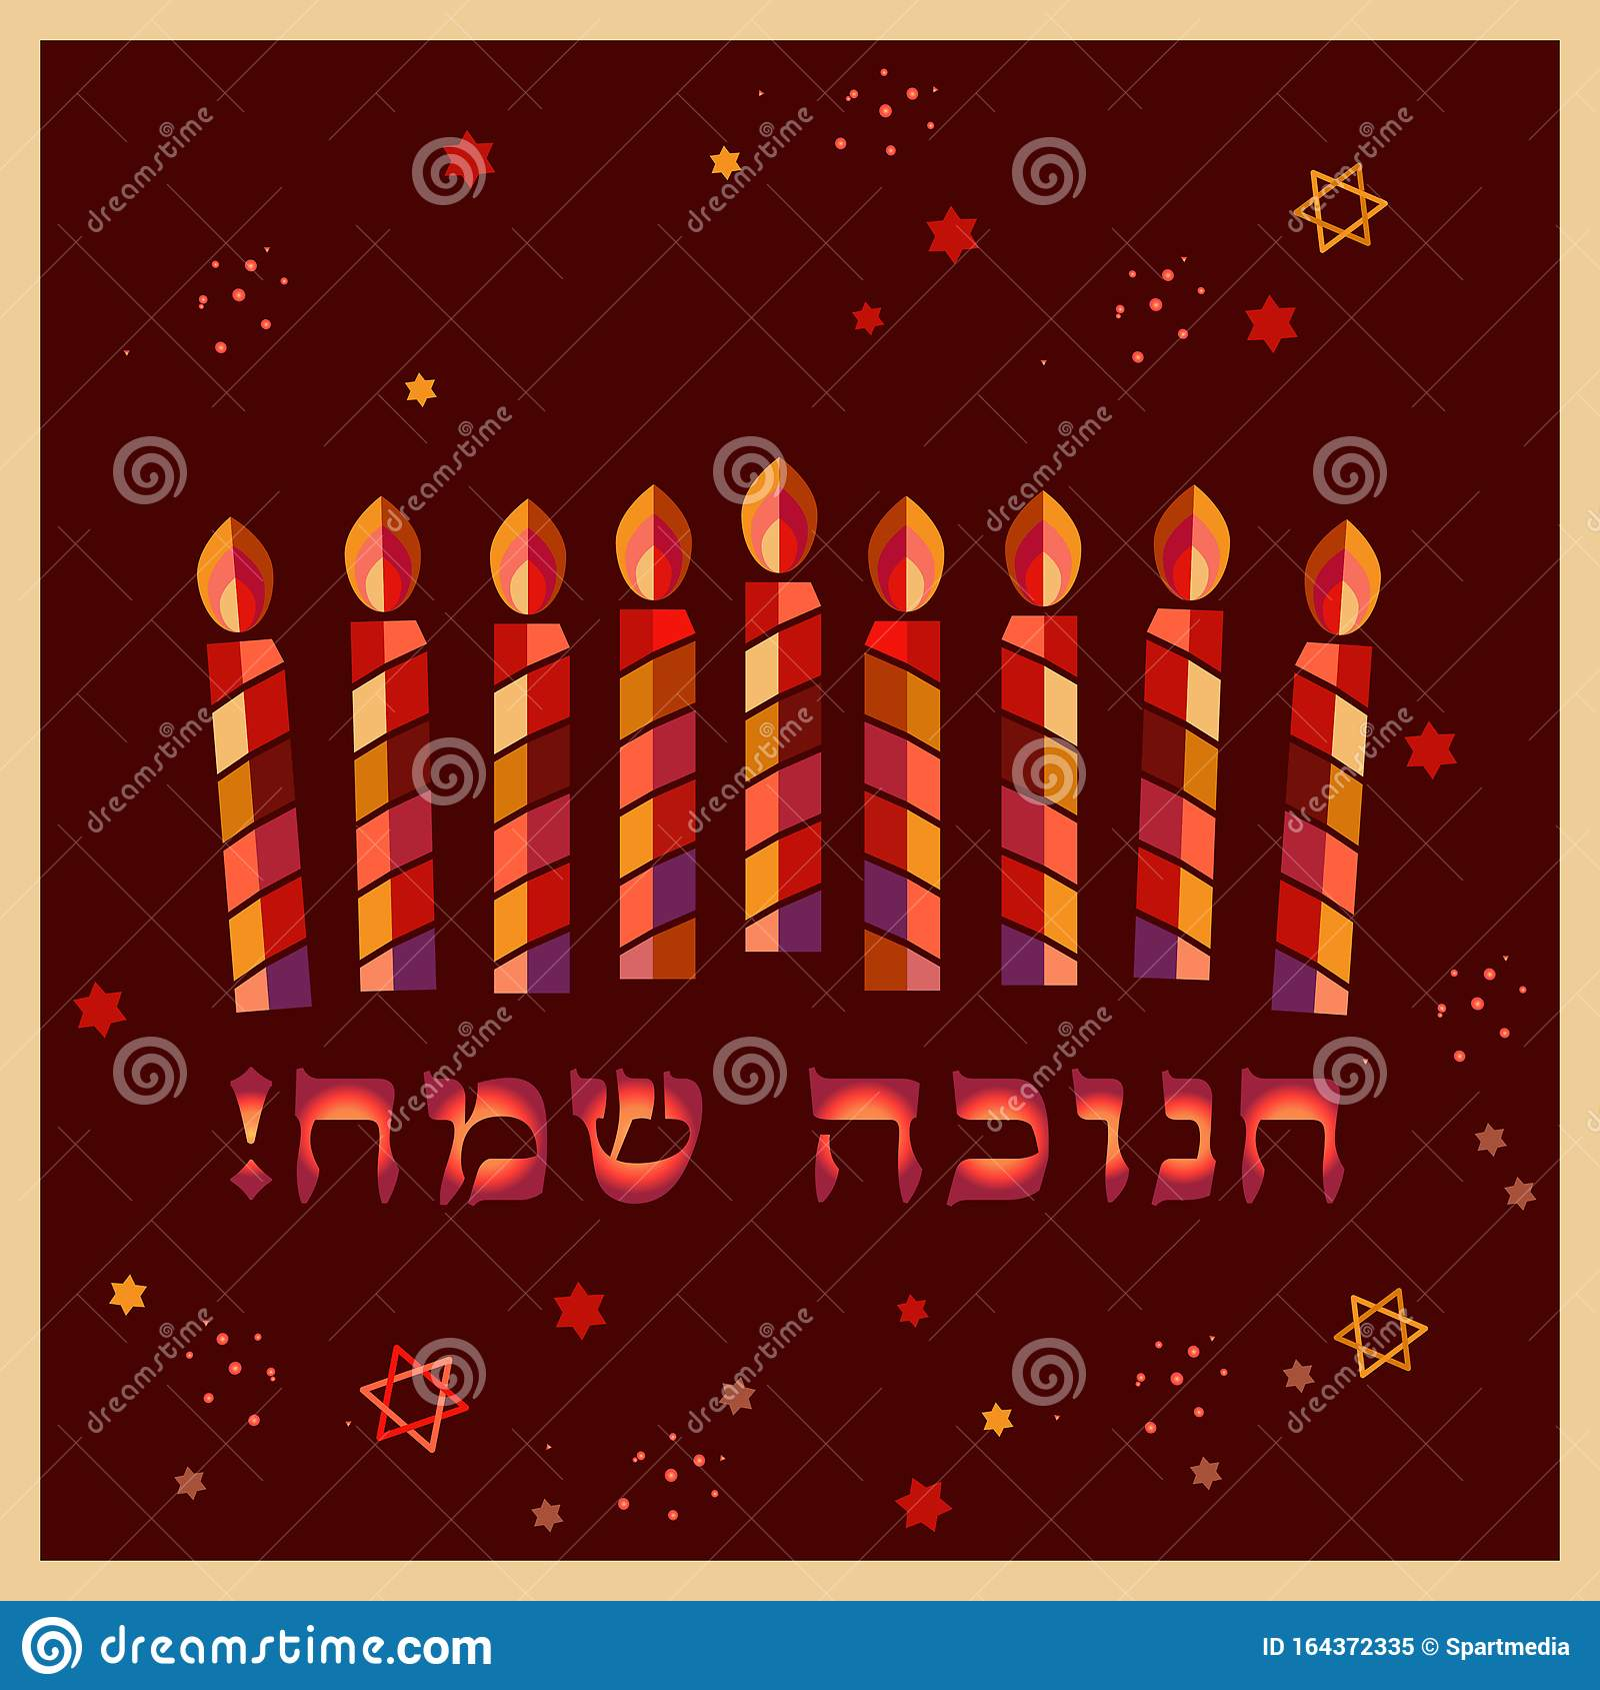 when did hanukkah start 2020